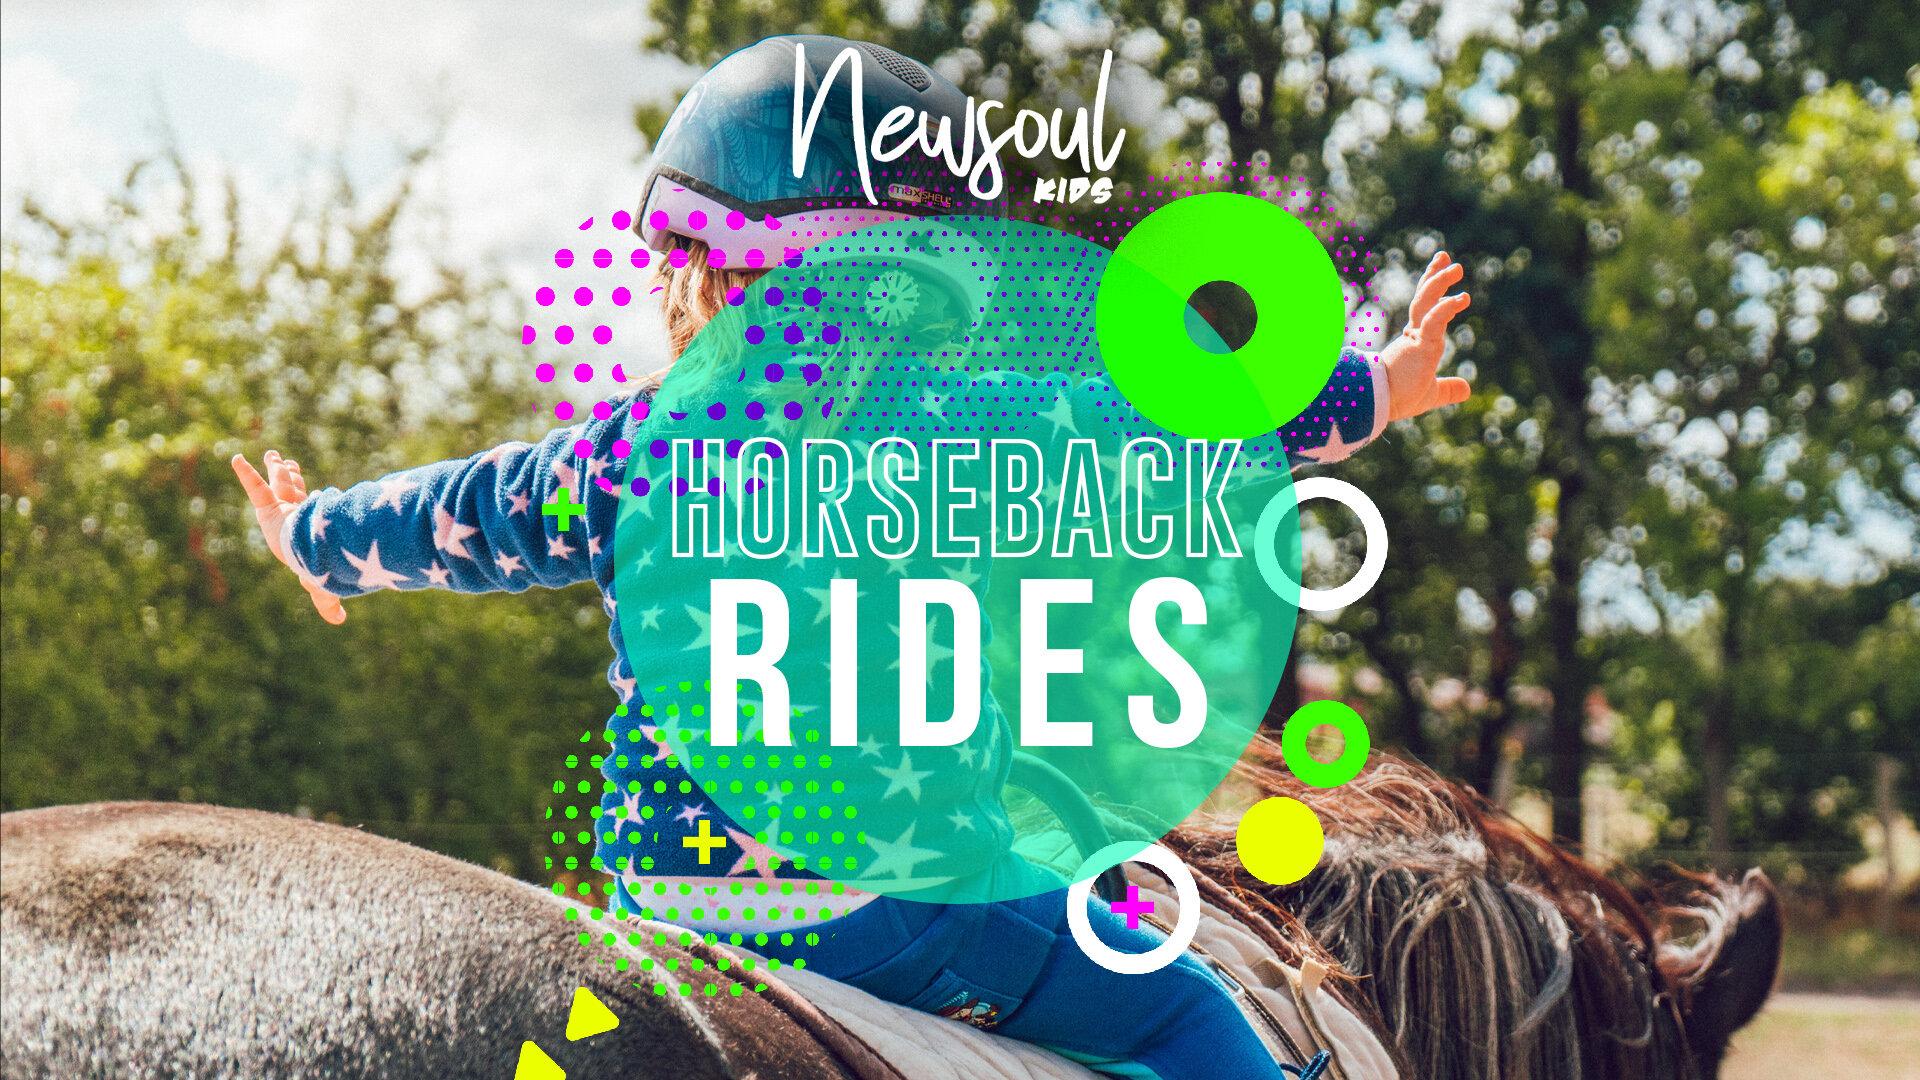 newsoul kids pony rides web.jpg